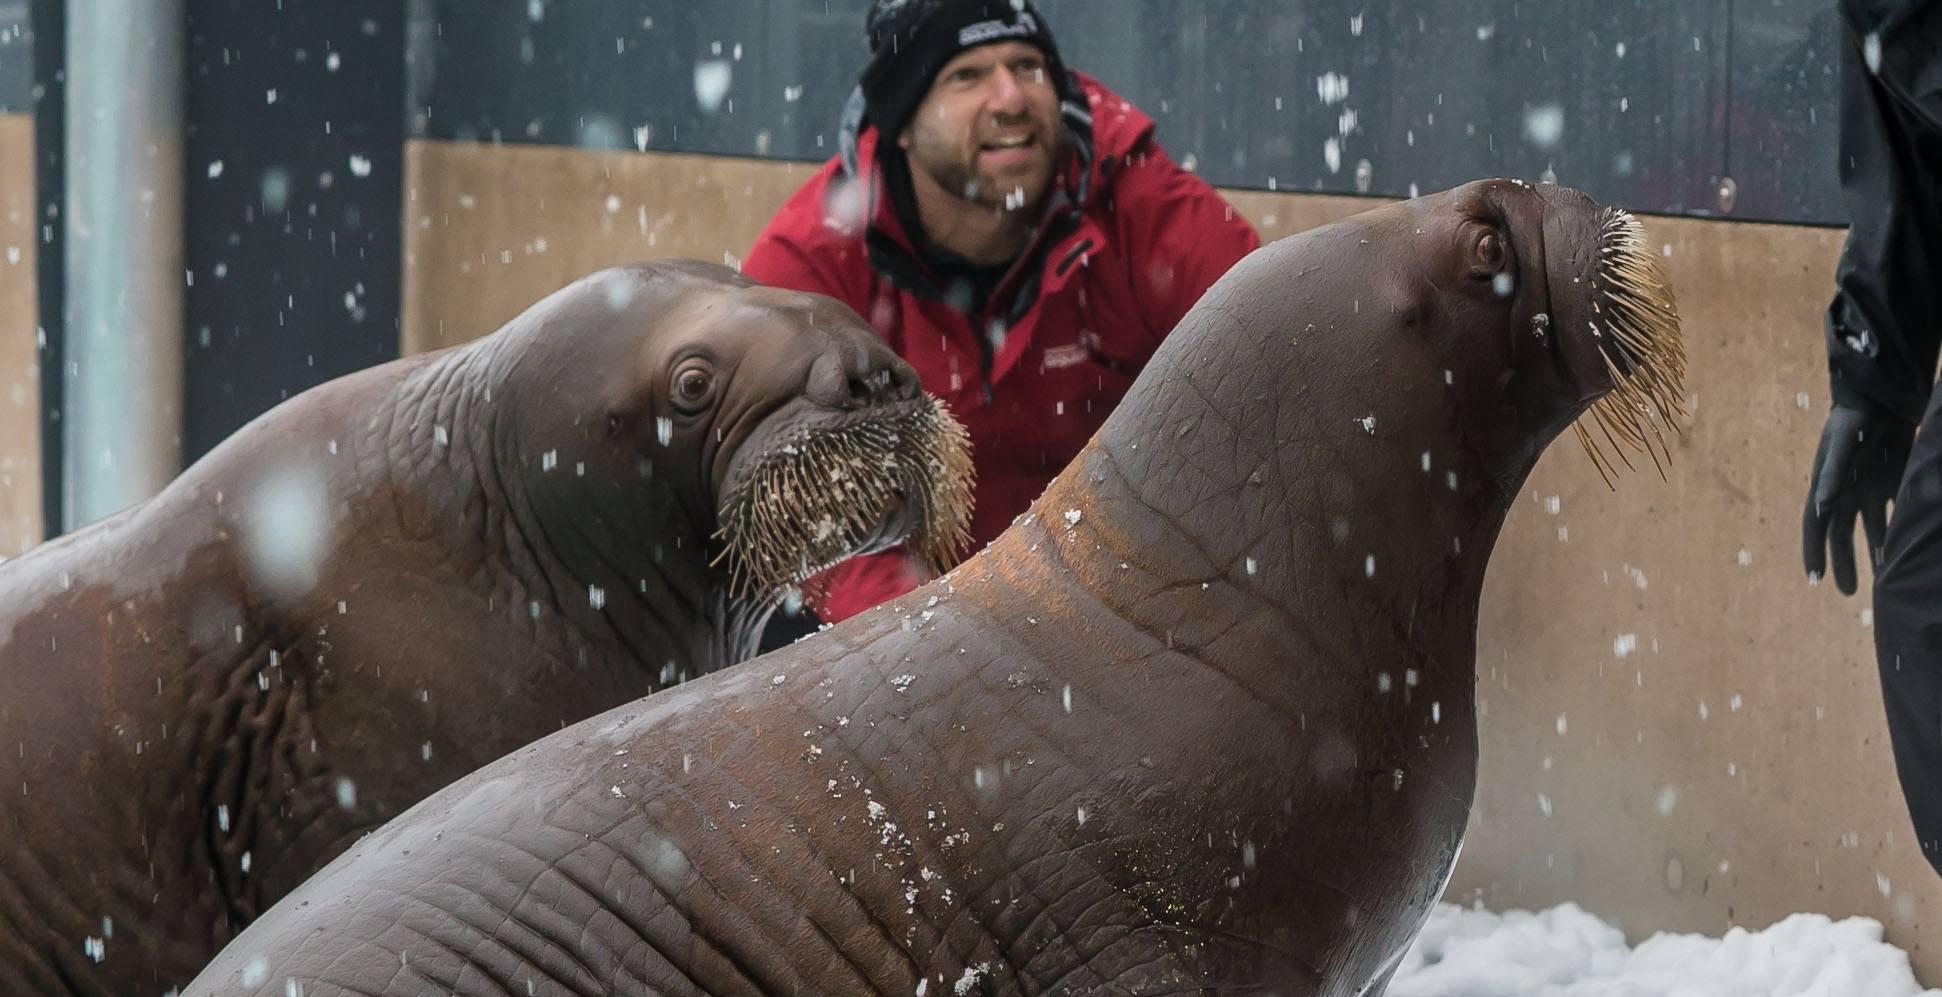 2 new walruses arrive at a snowy Vancouver Aquarium (PHOTOS)